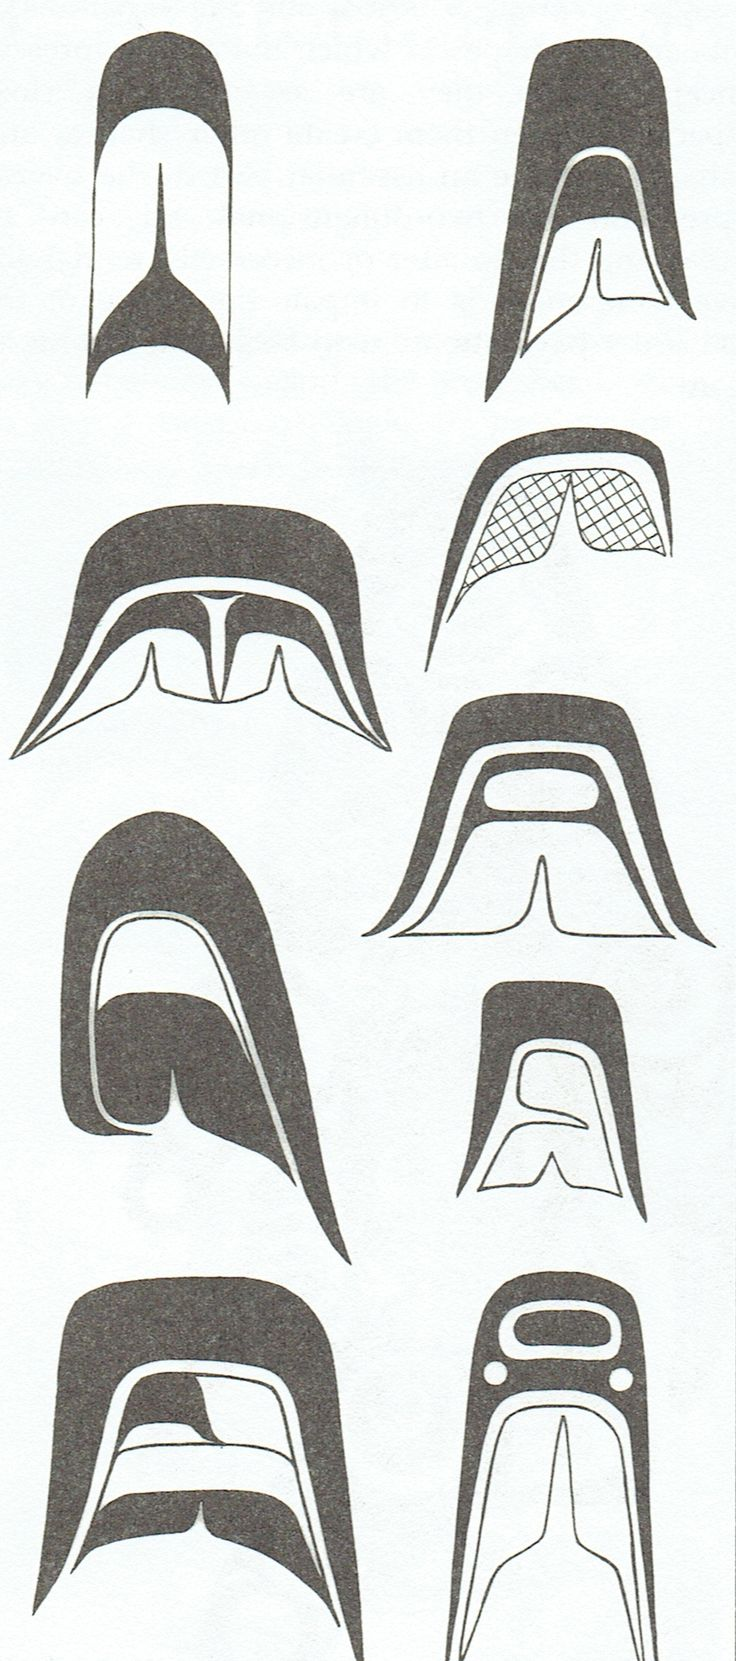 More detailed Split U design elements used in Westcoast Native Art.